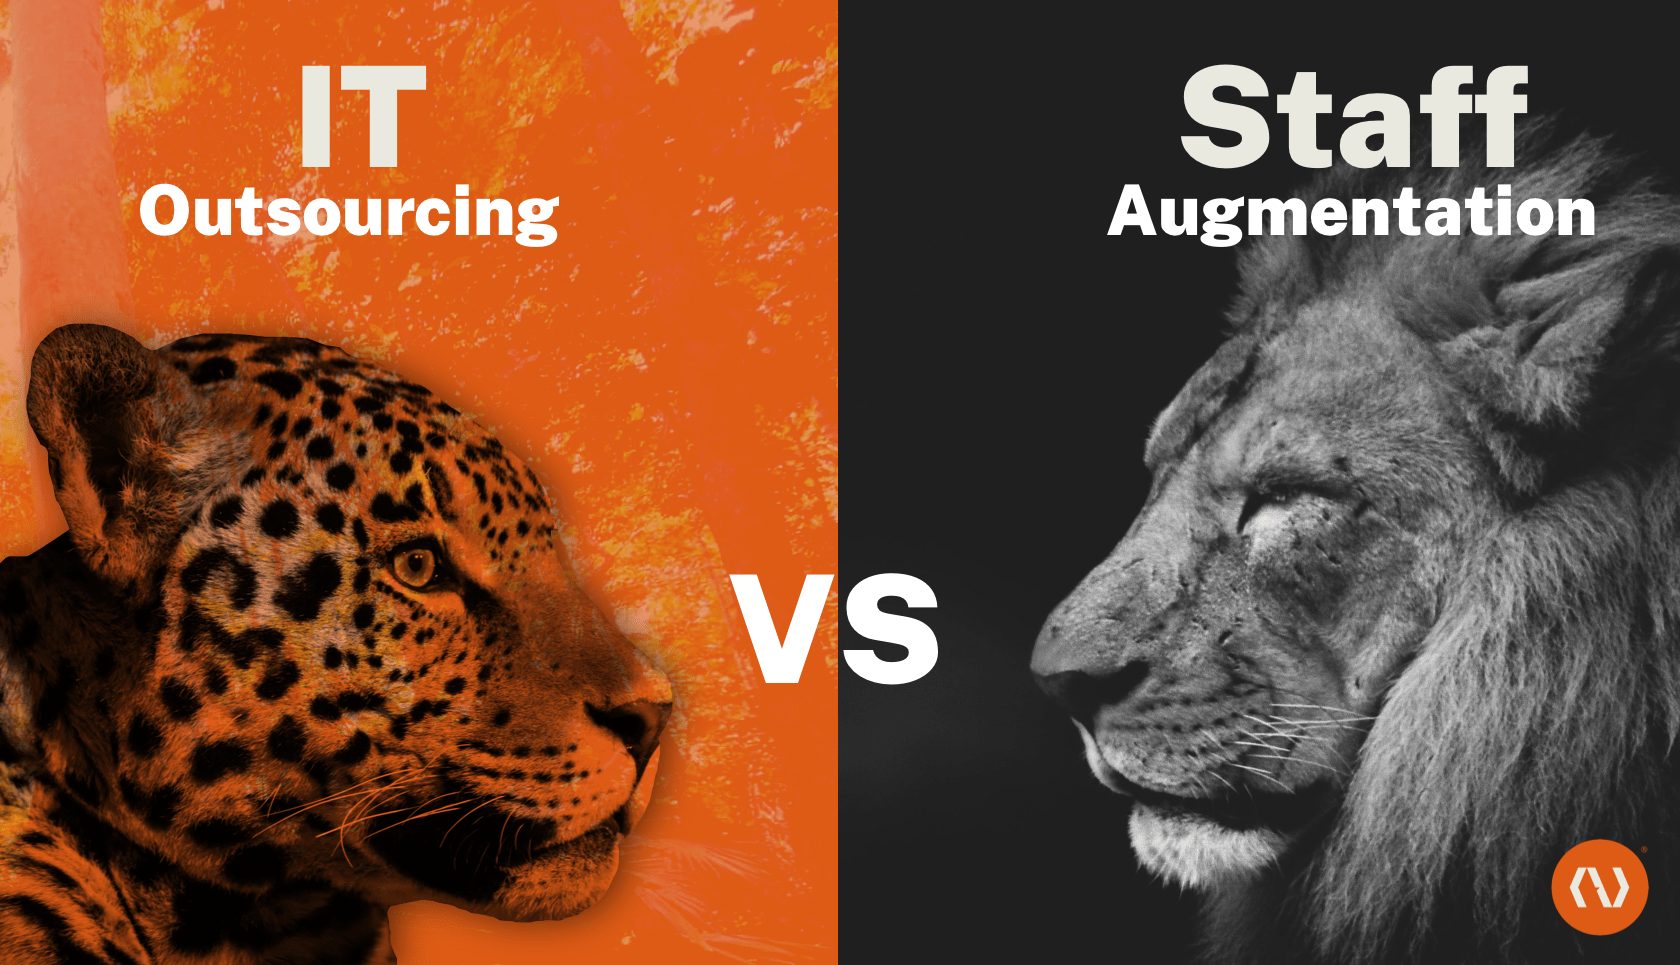 IT Outsourcing vs Staff Augmentation